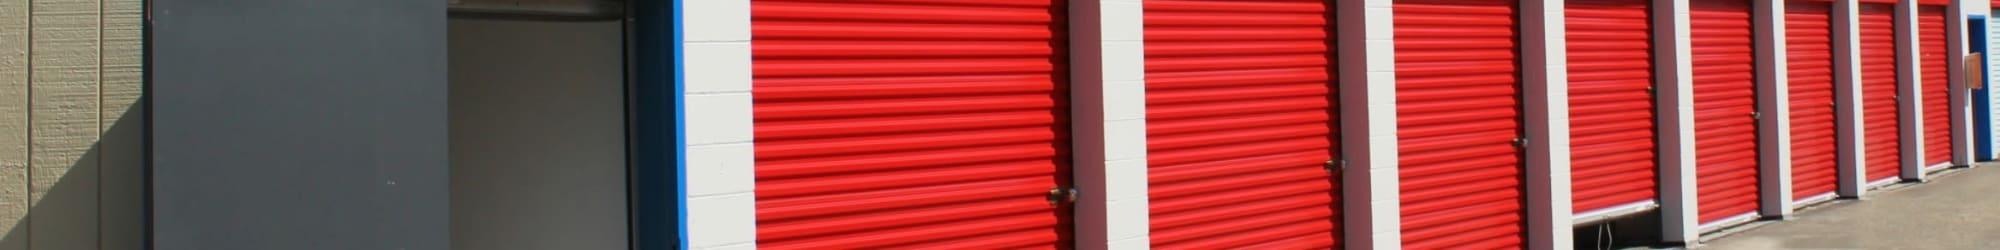 Climate-controlled storage at Trojan Storage Everett, Washington